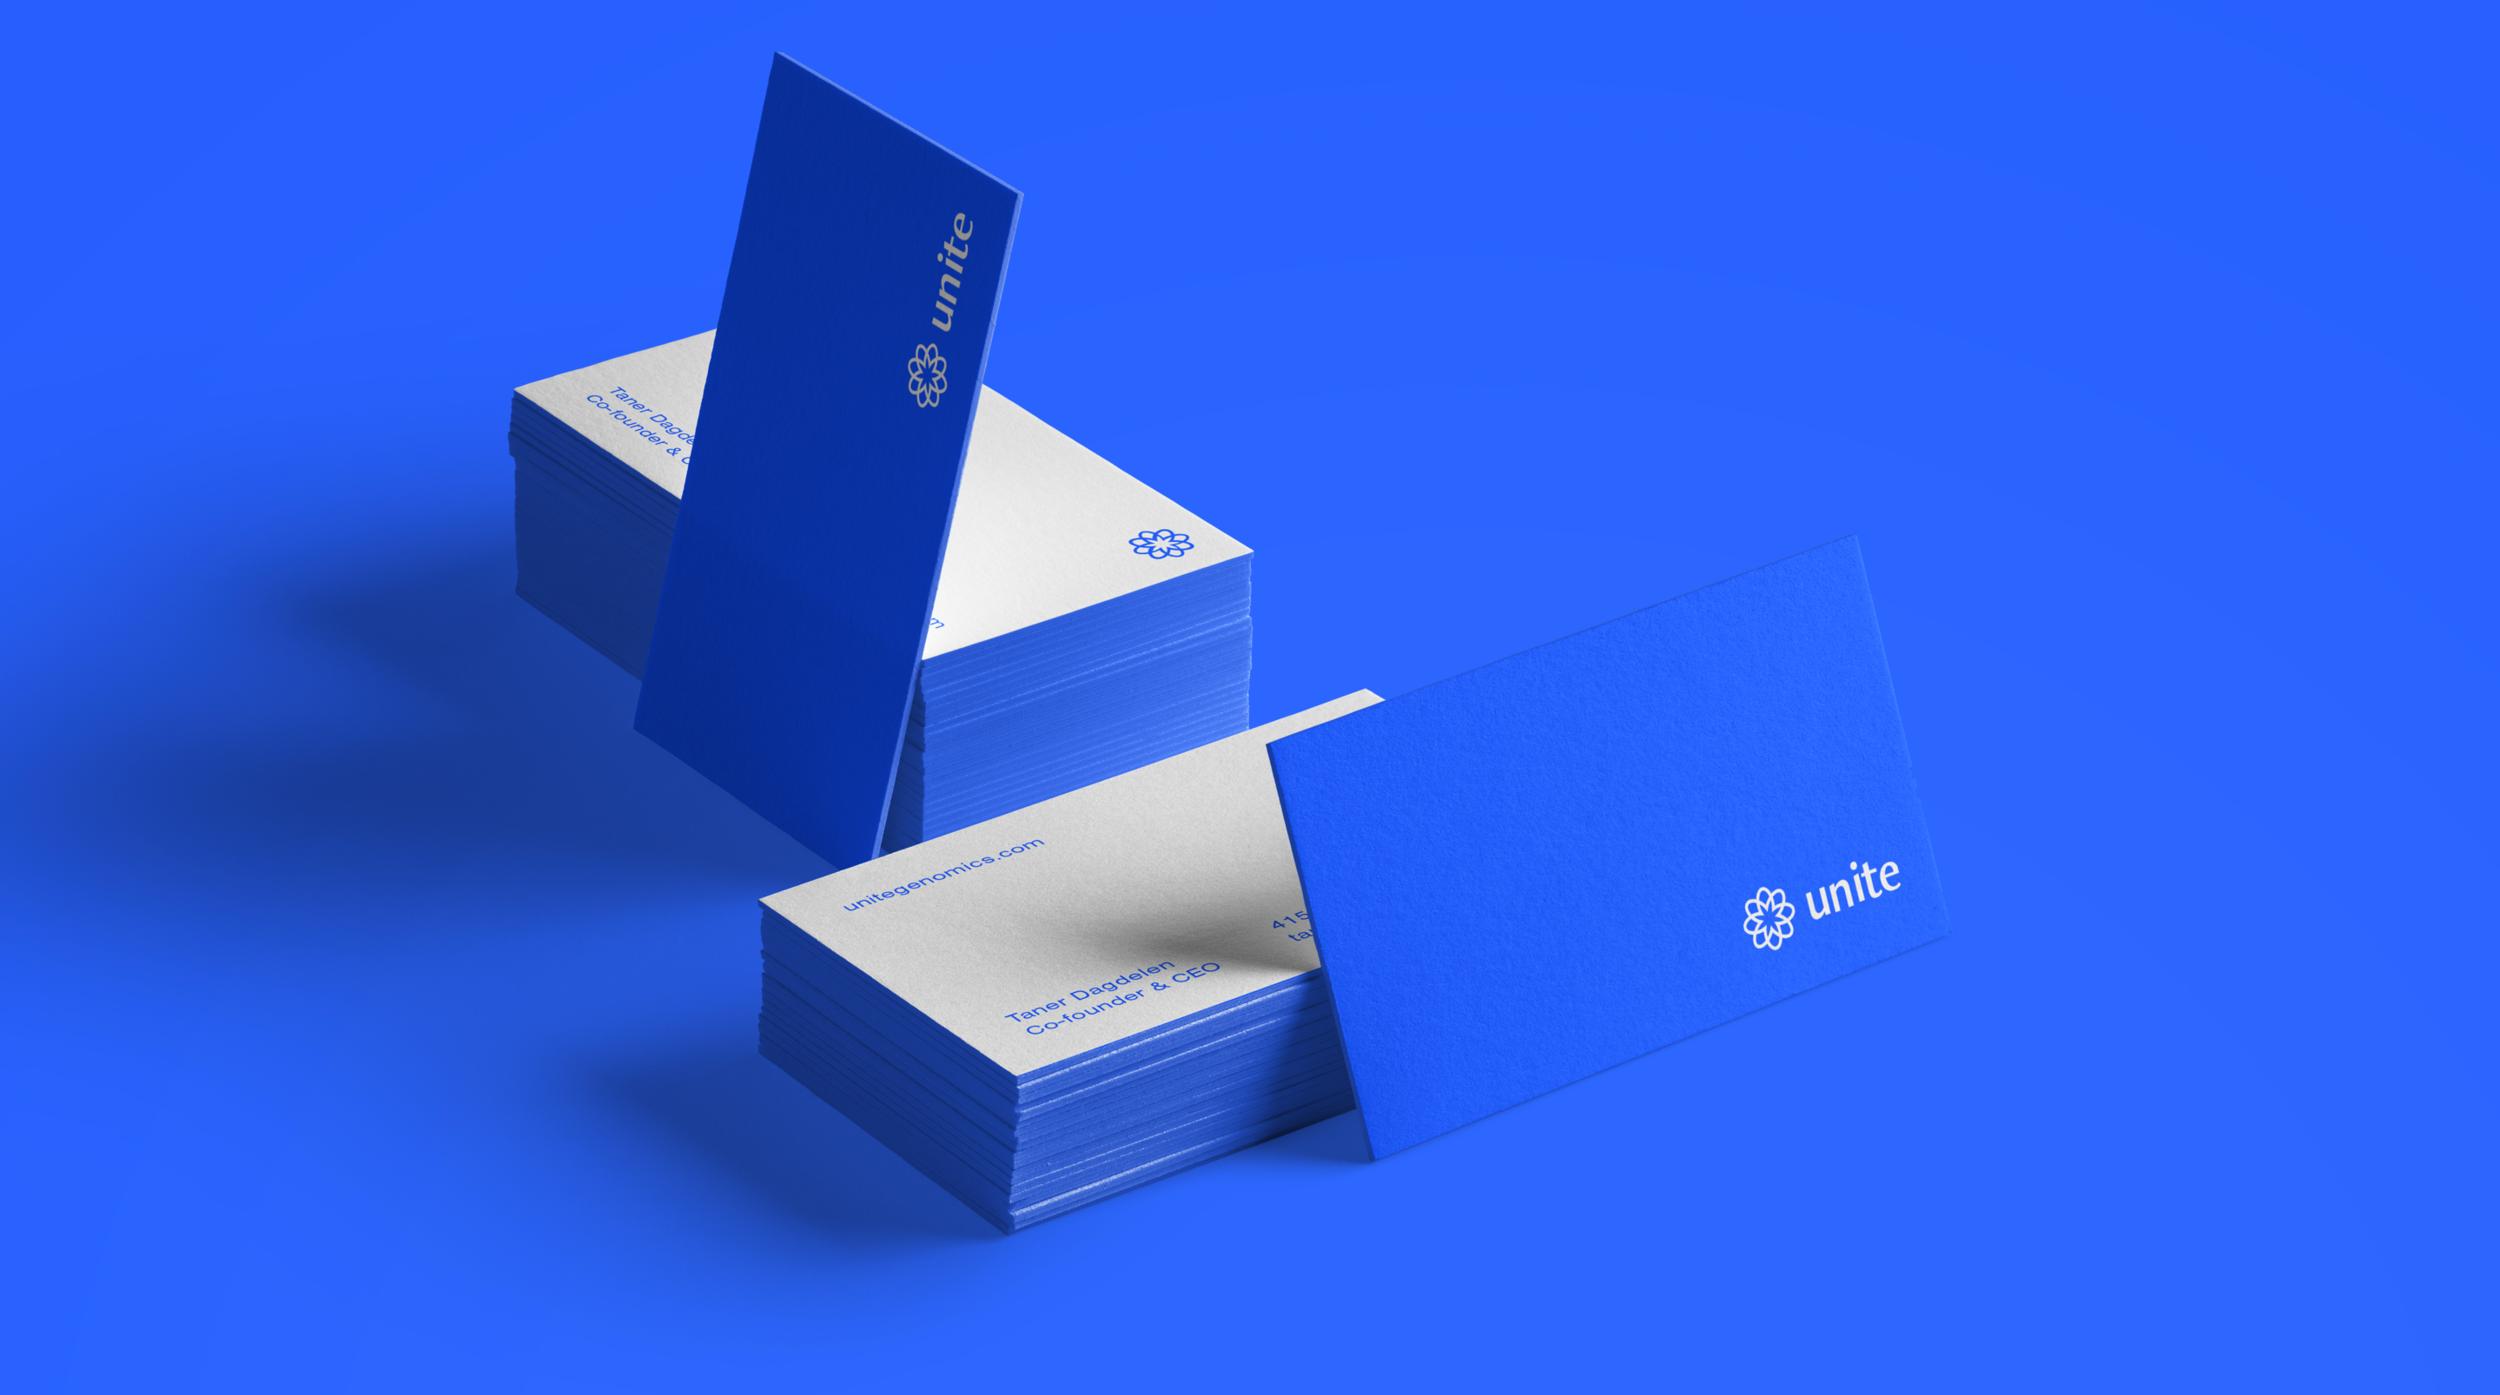 unite-genomics-branding-8.png